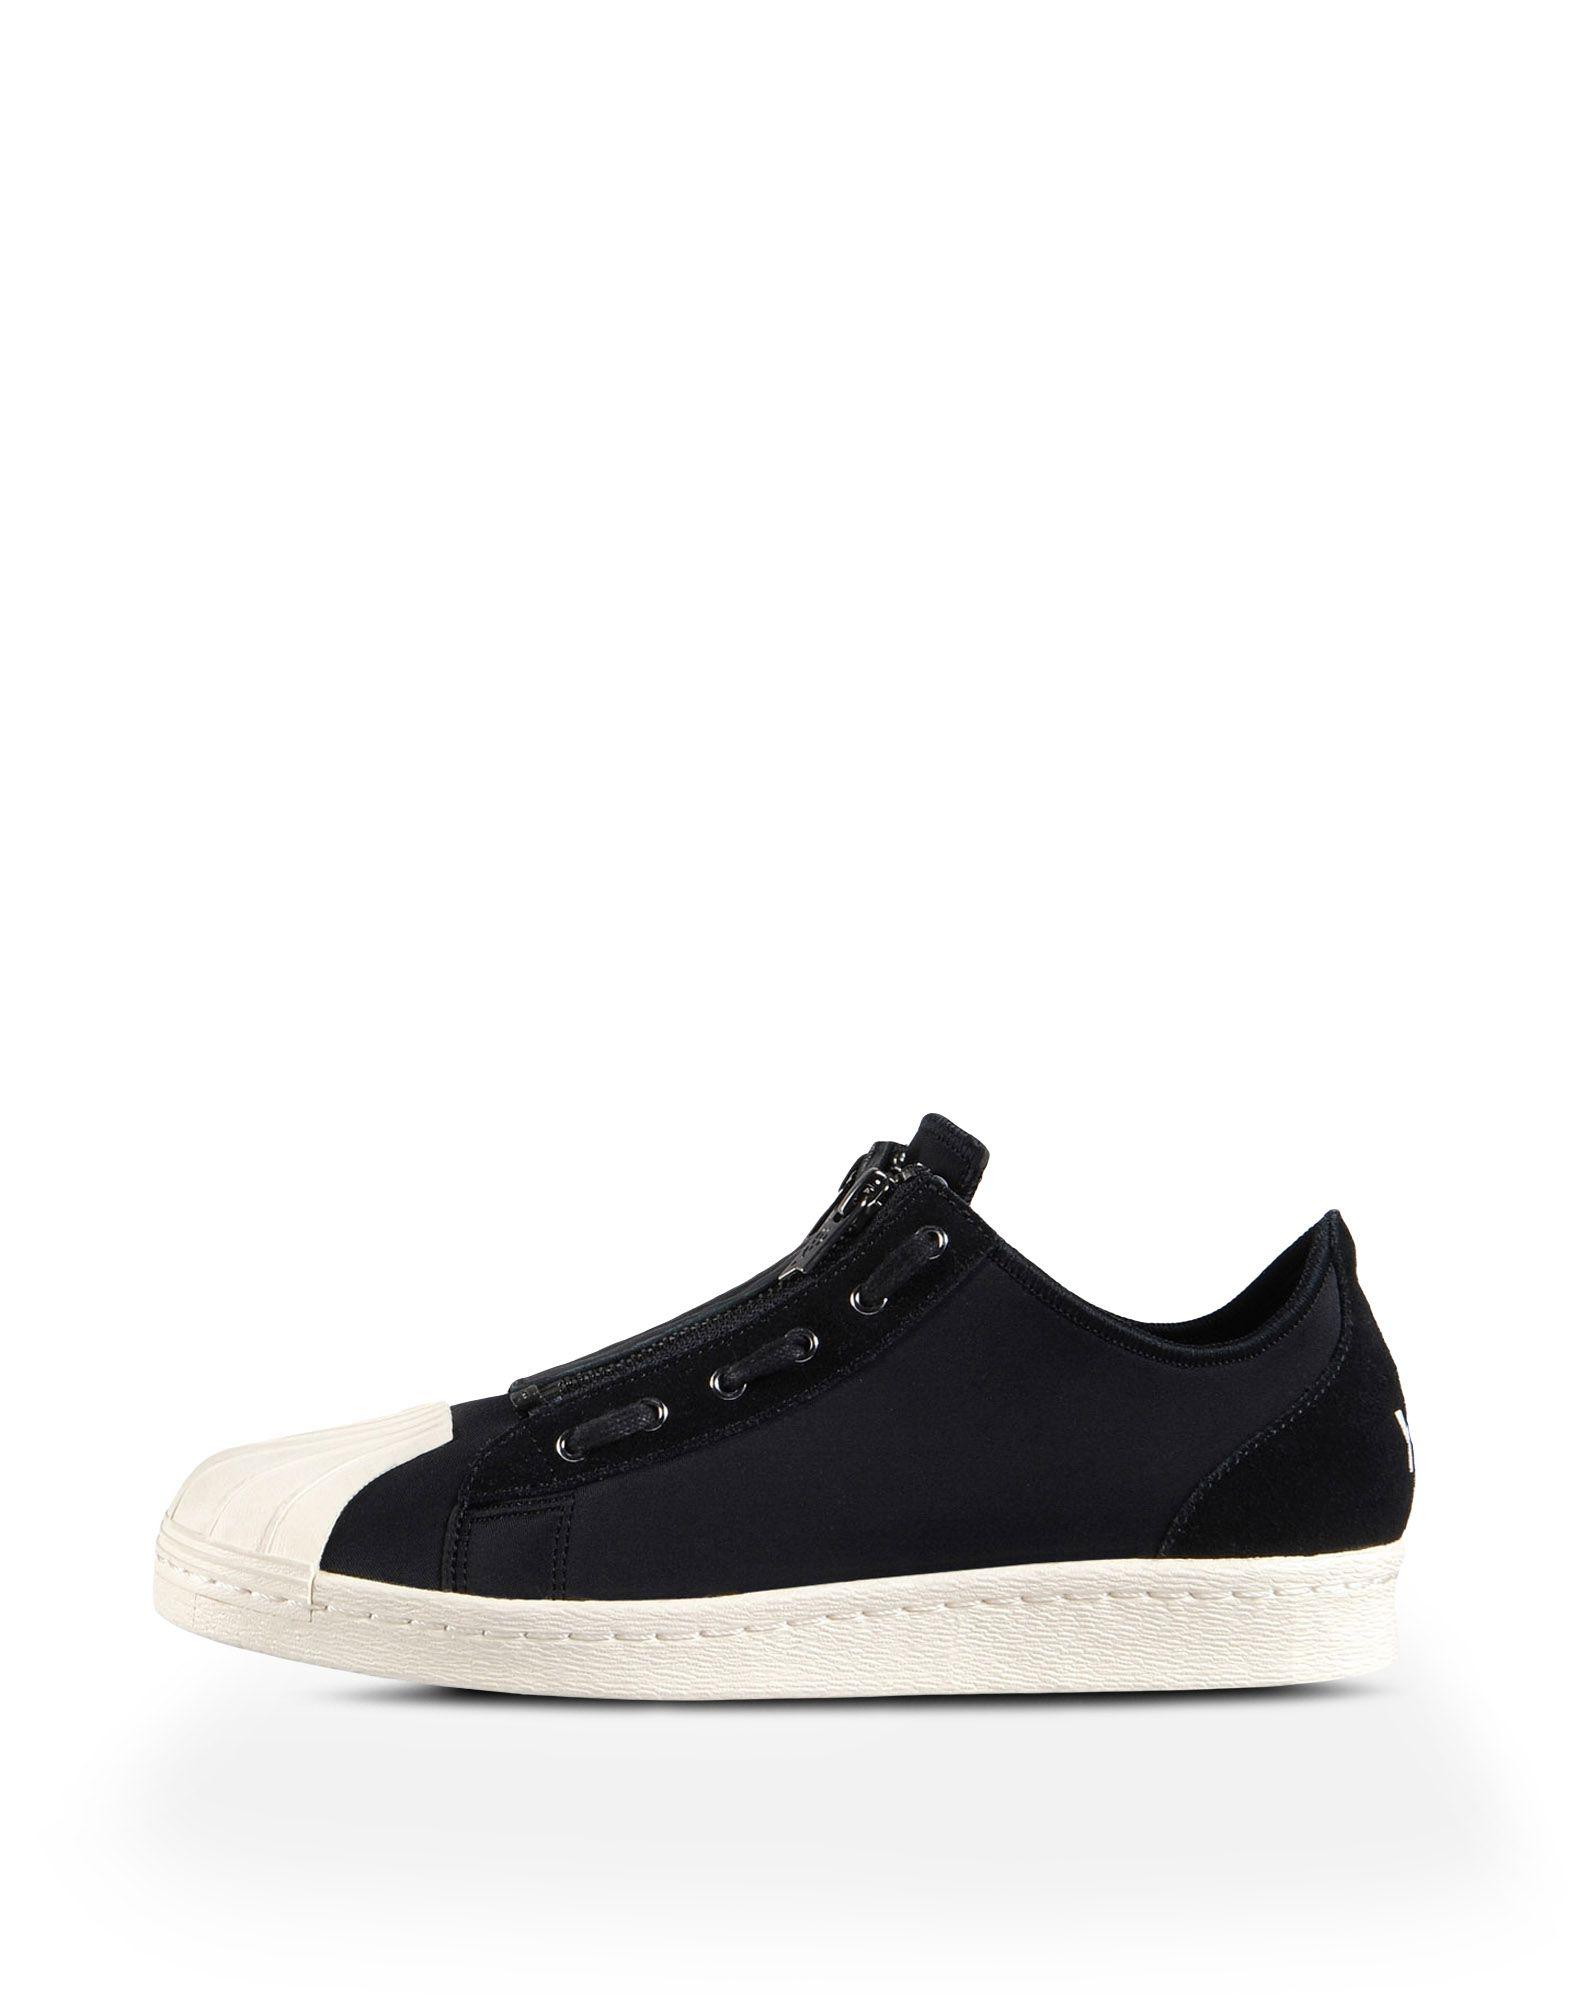 adidas y3 uk store